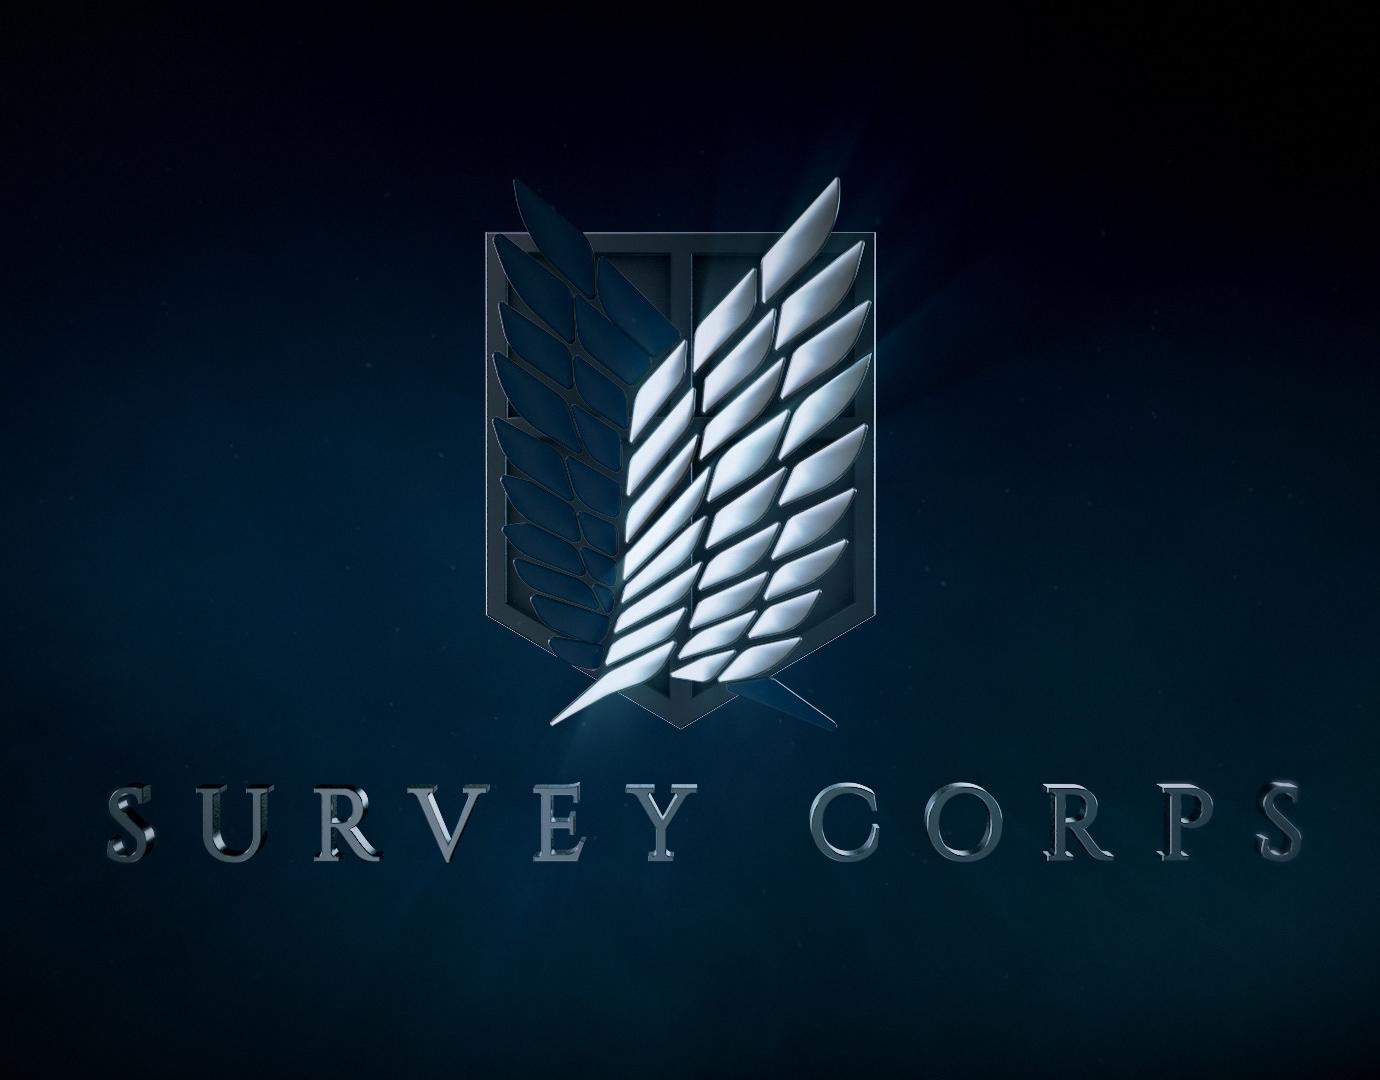 Garrett Lee Aot Survey Corps Title Animation